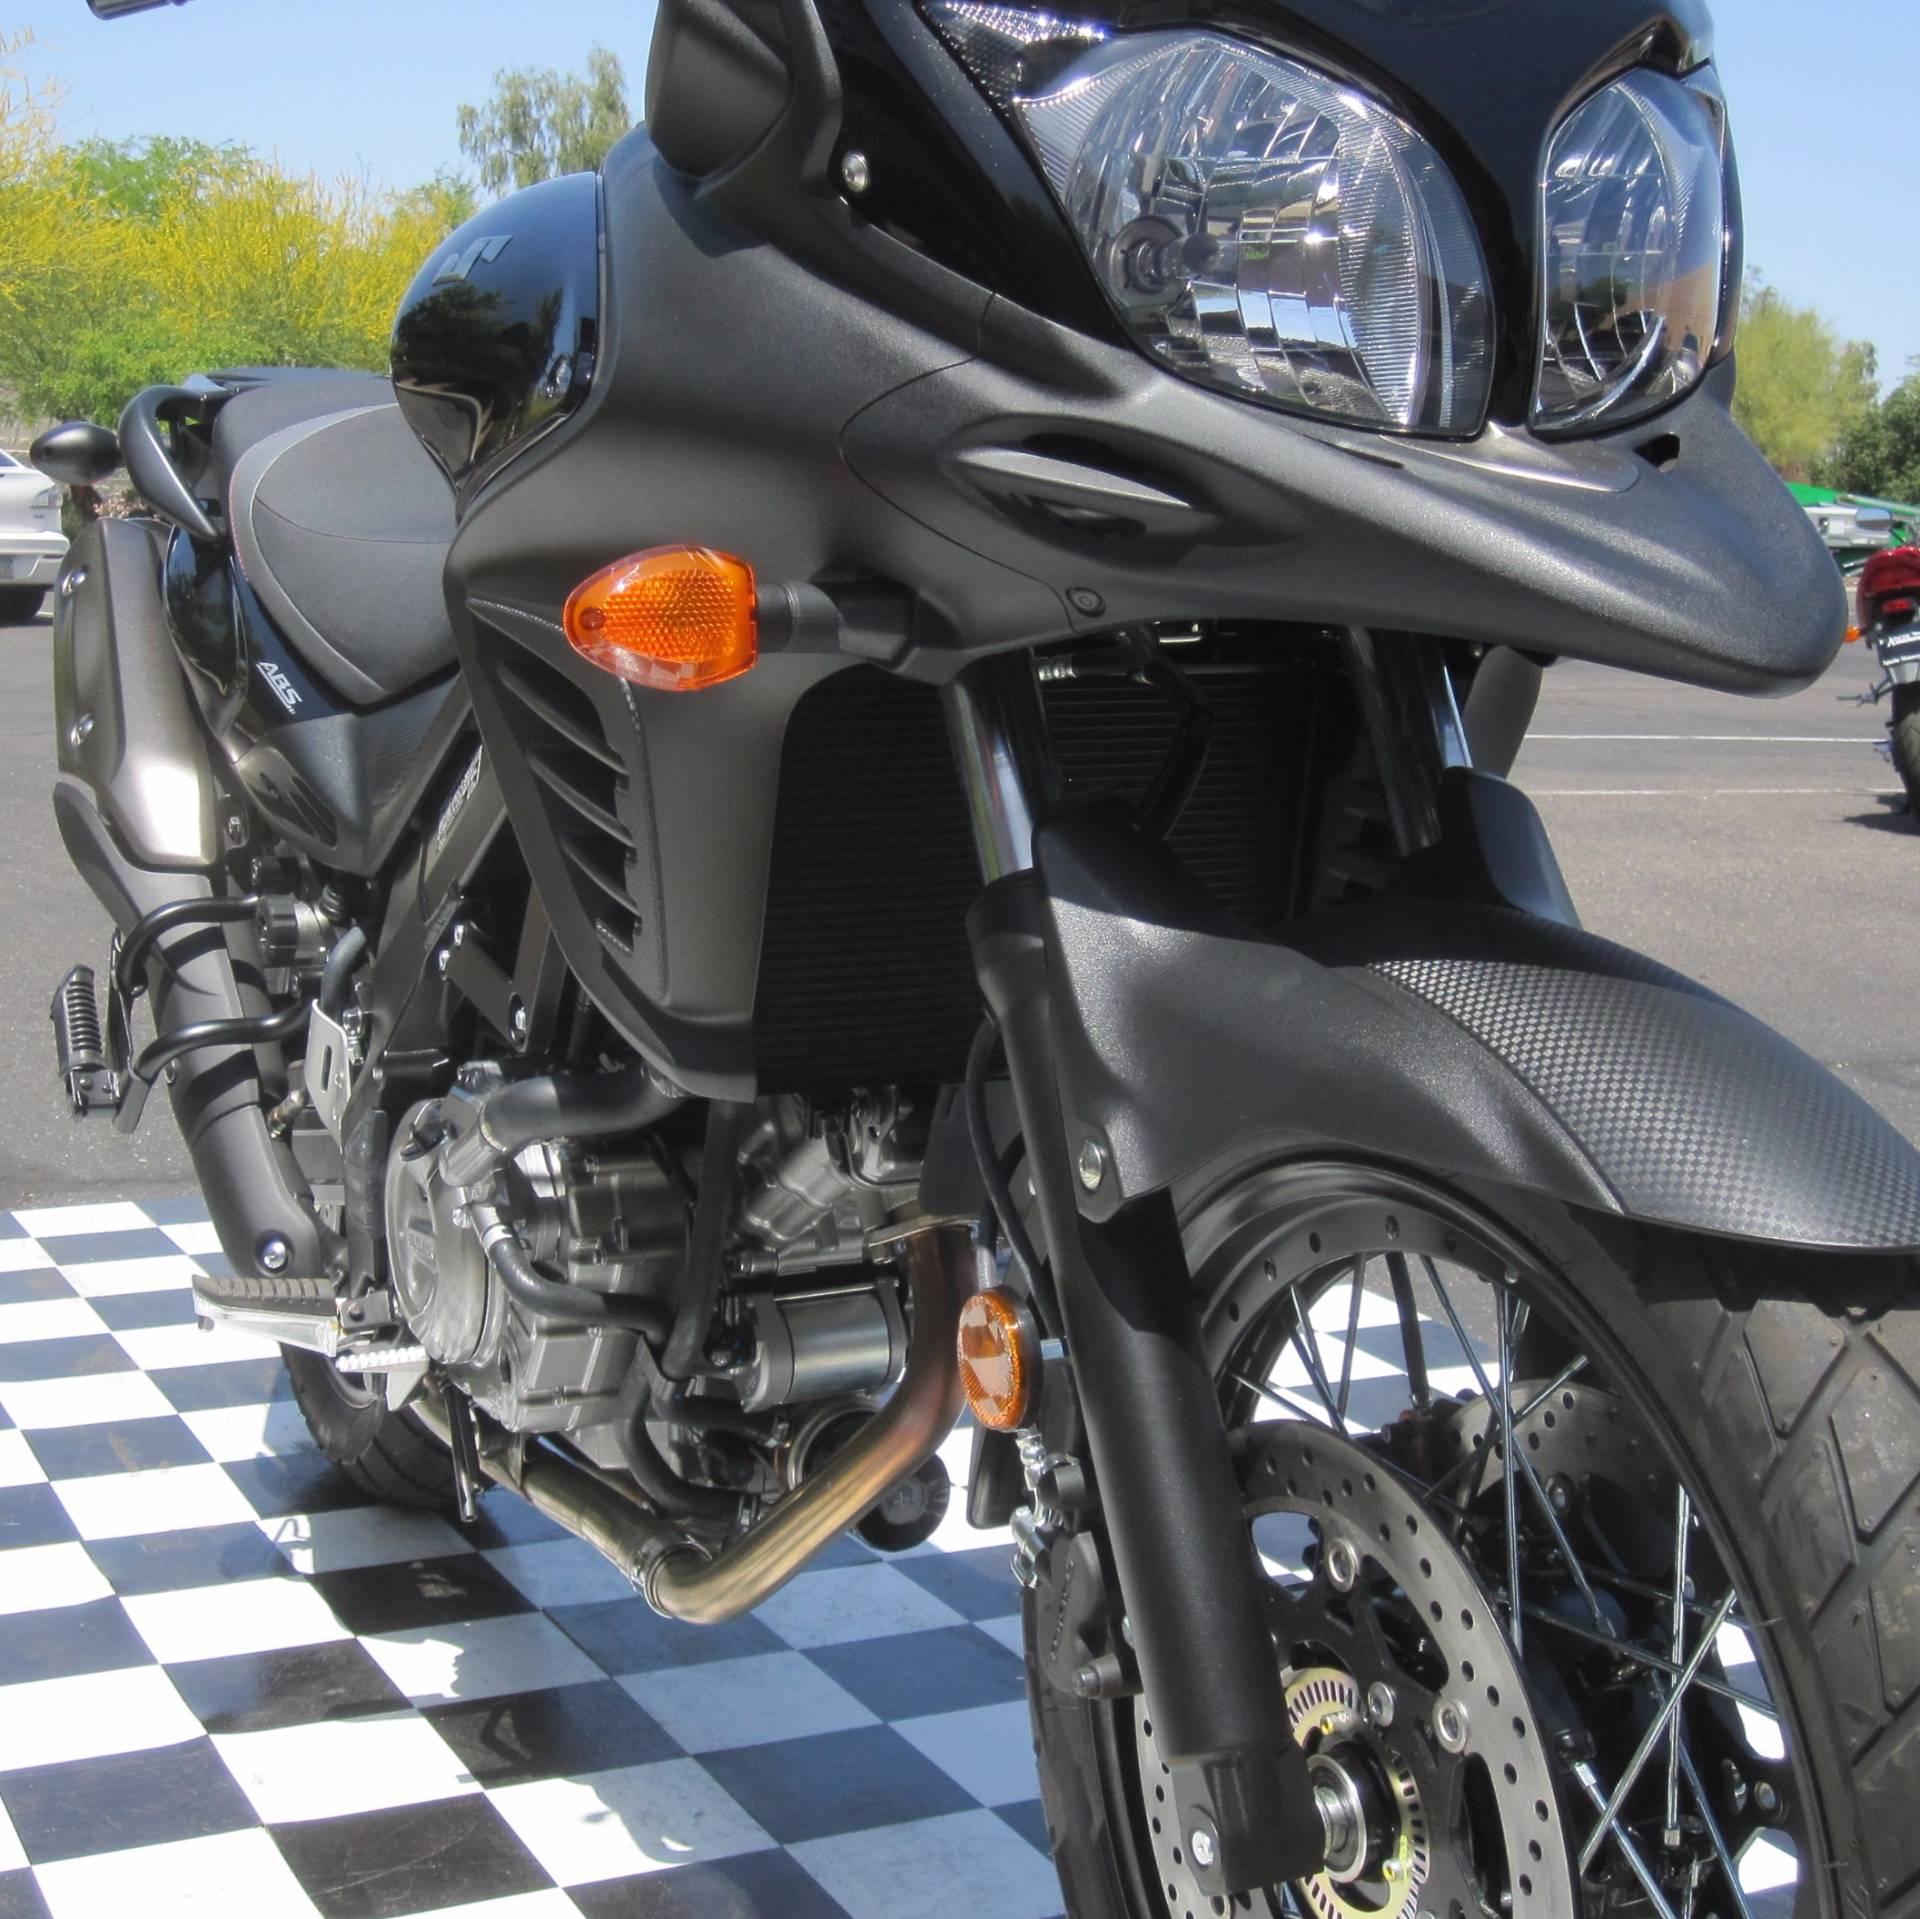 2016 Suzuki V-Strom 650 XT ABS in Phoenix, Arizona